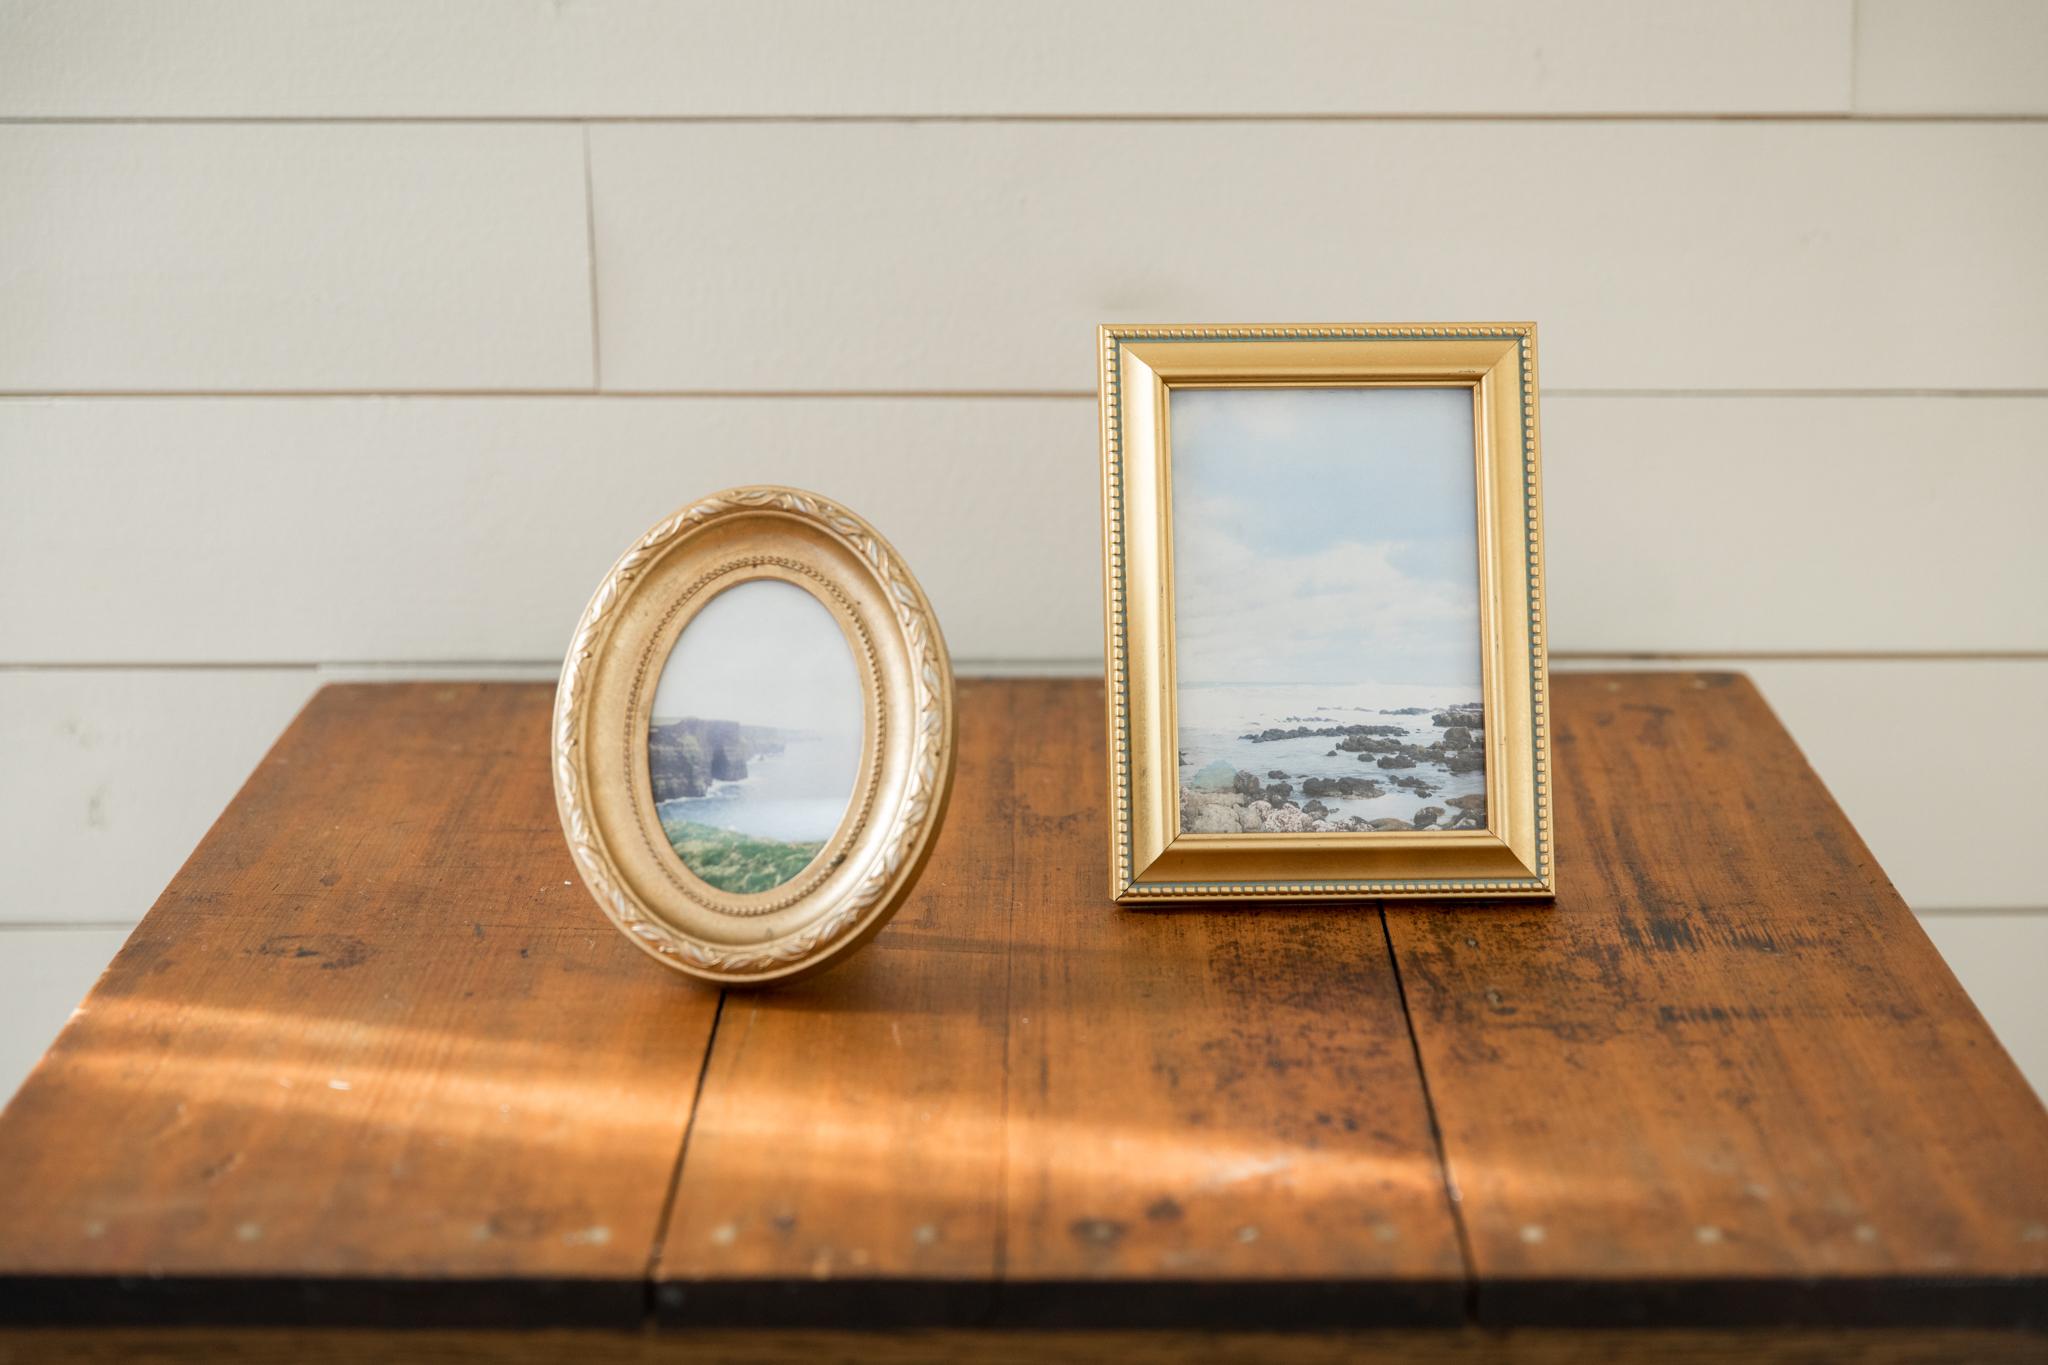 Mismatched picture frames